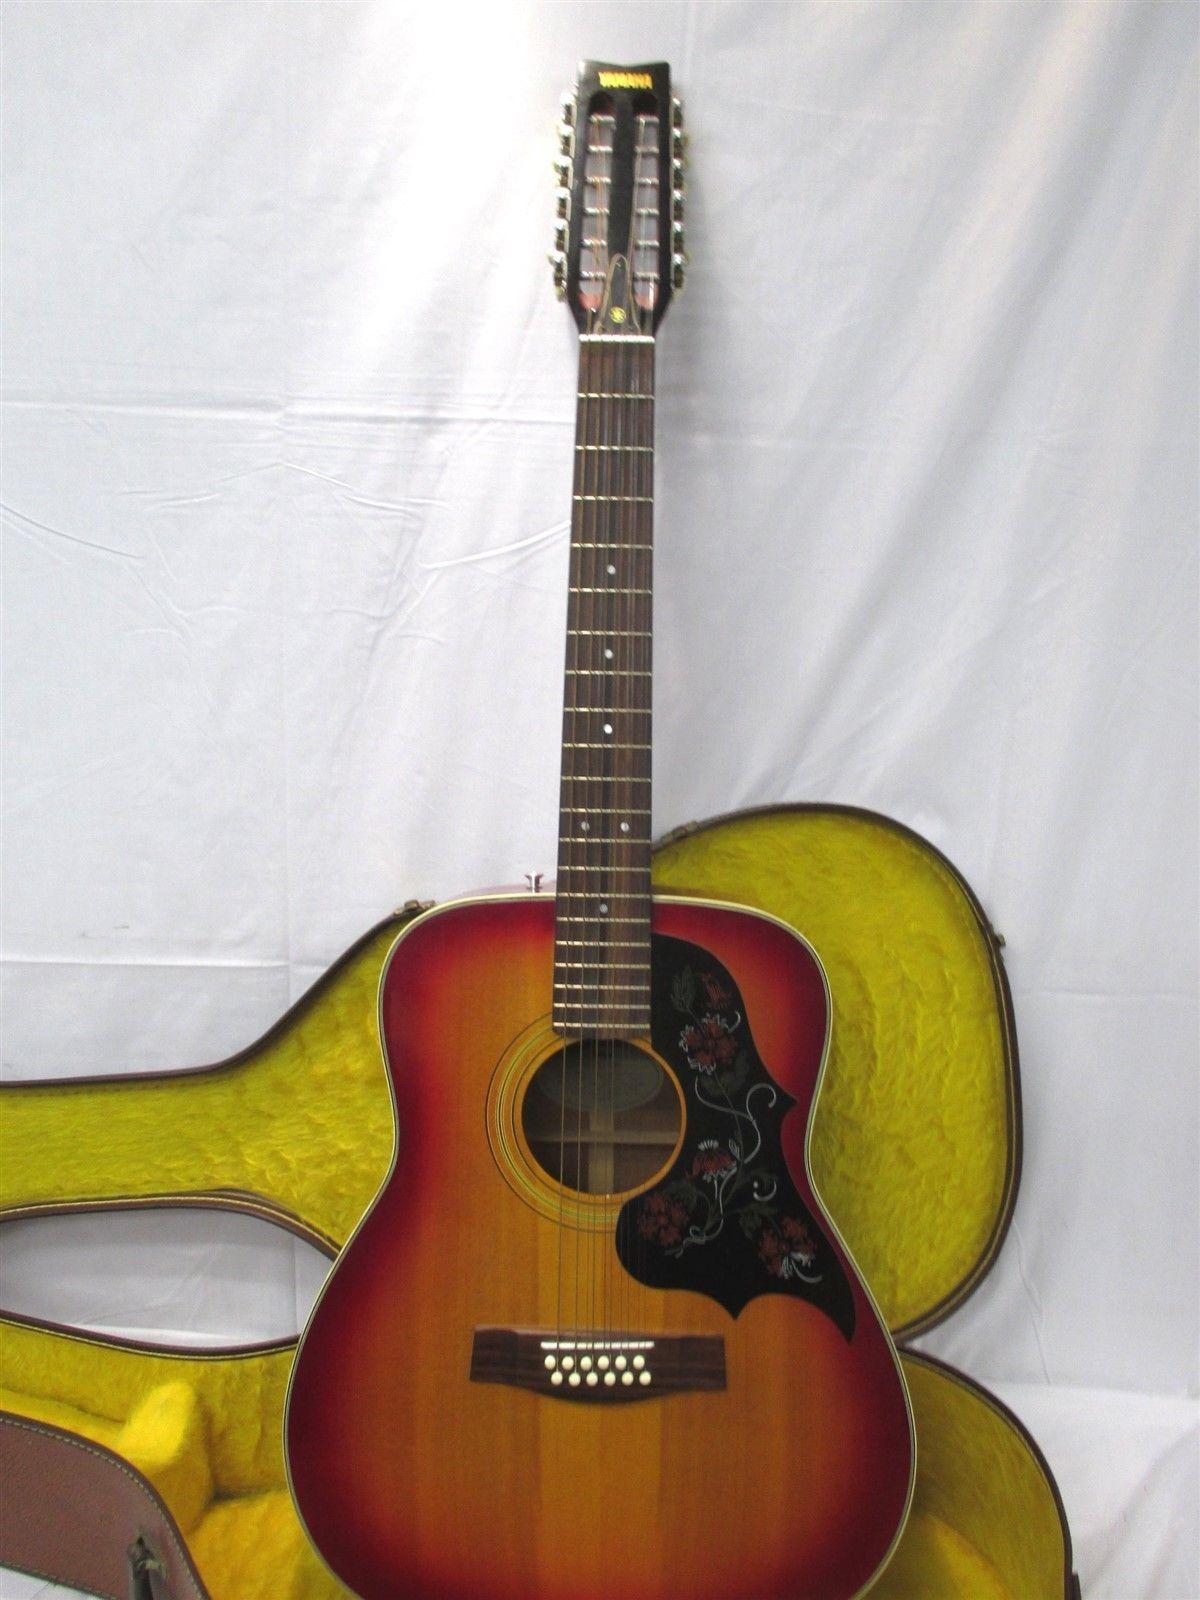 4104f7a9c6 #guitar Yamaha FG-412SB 12-String Cherry Sunburst Acoustic Guitar FG412SB  Taiwan please retweet